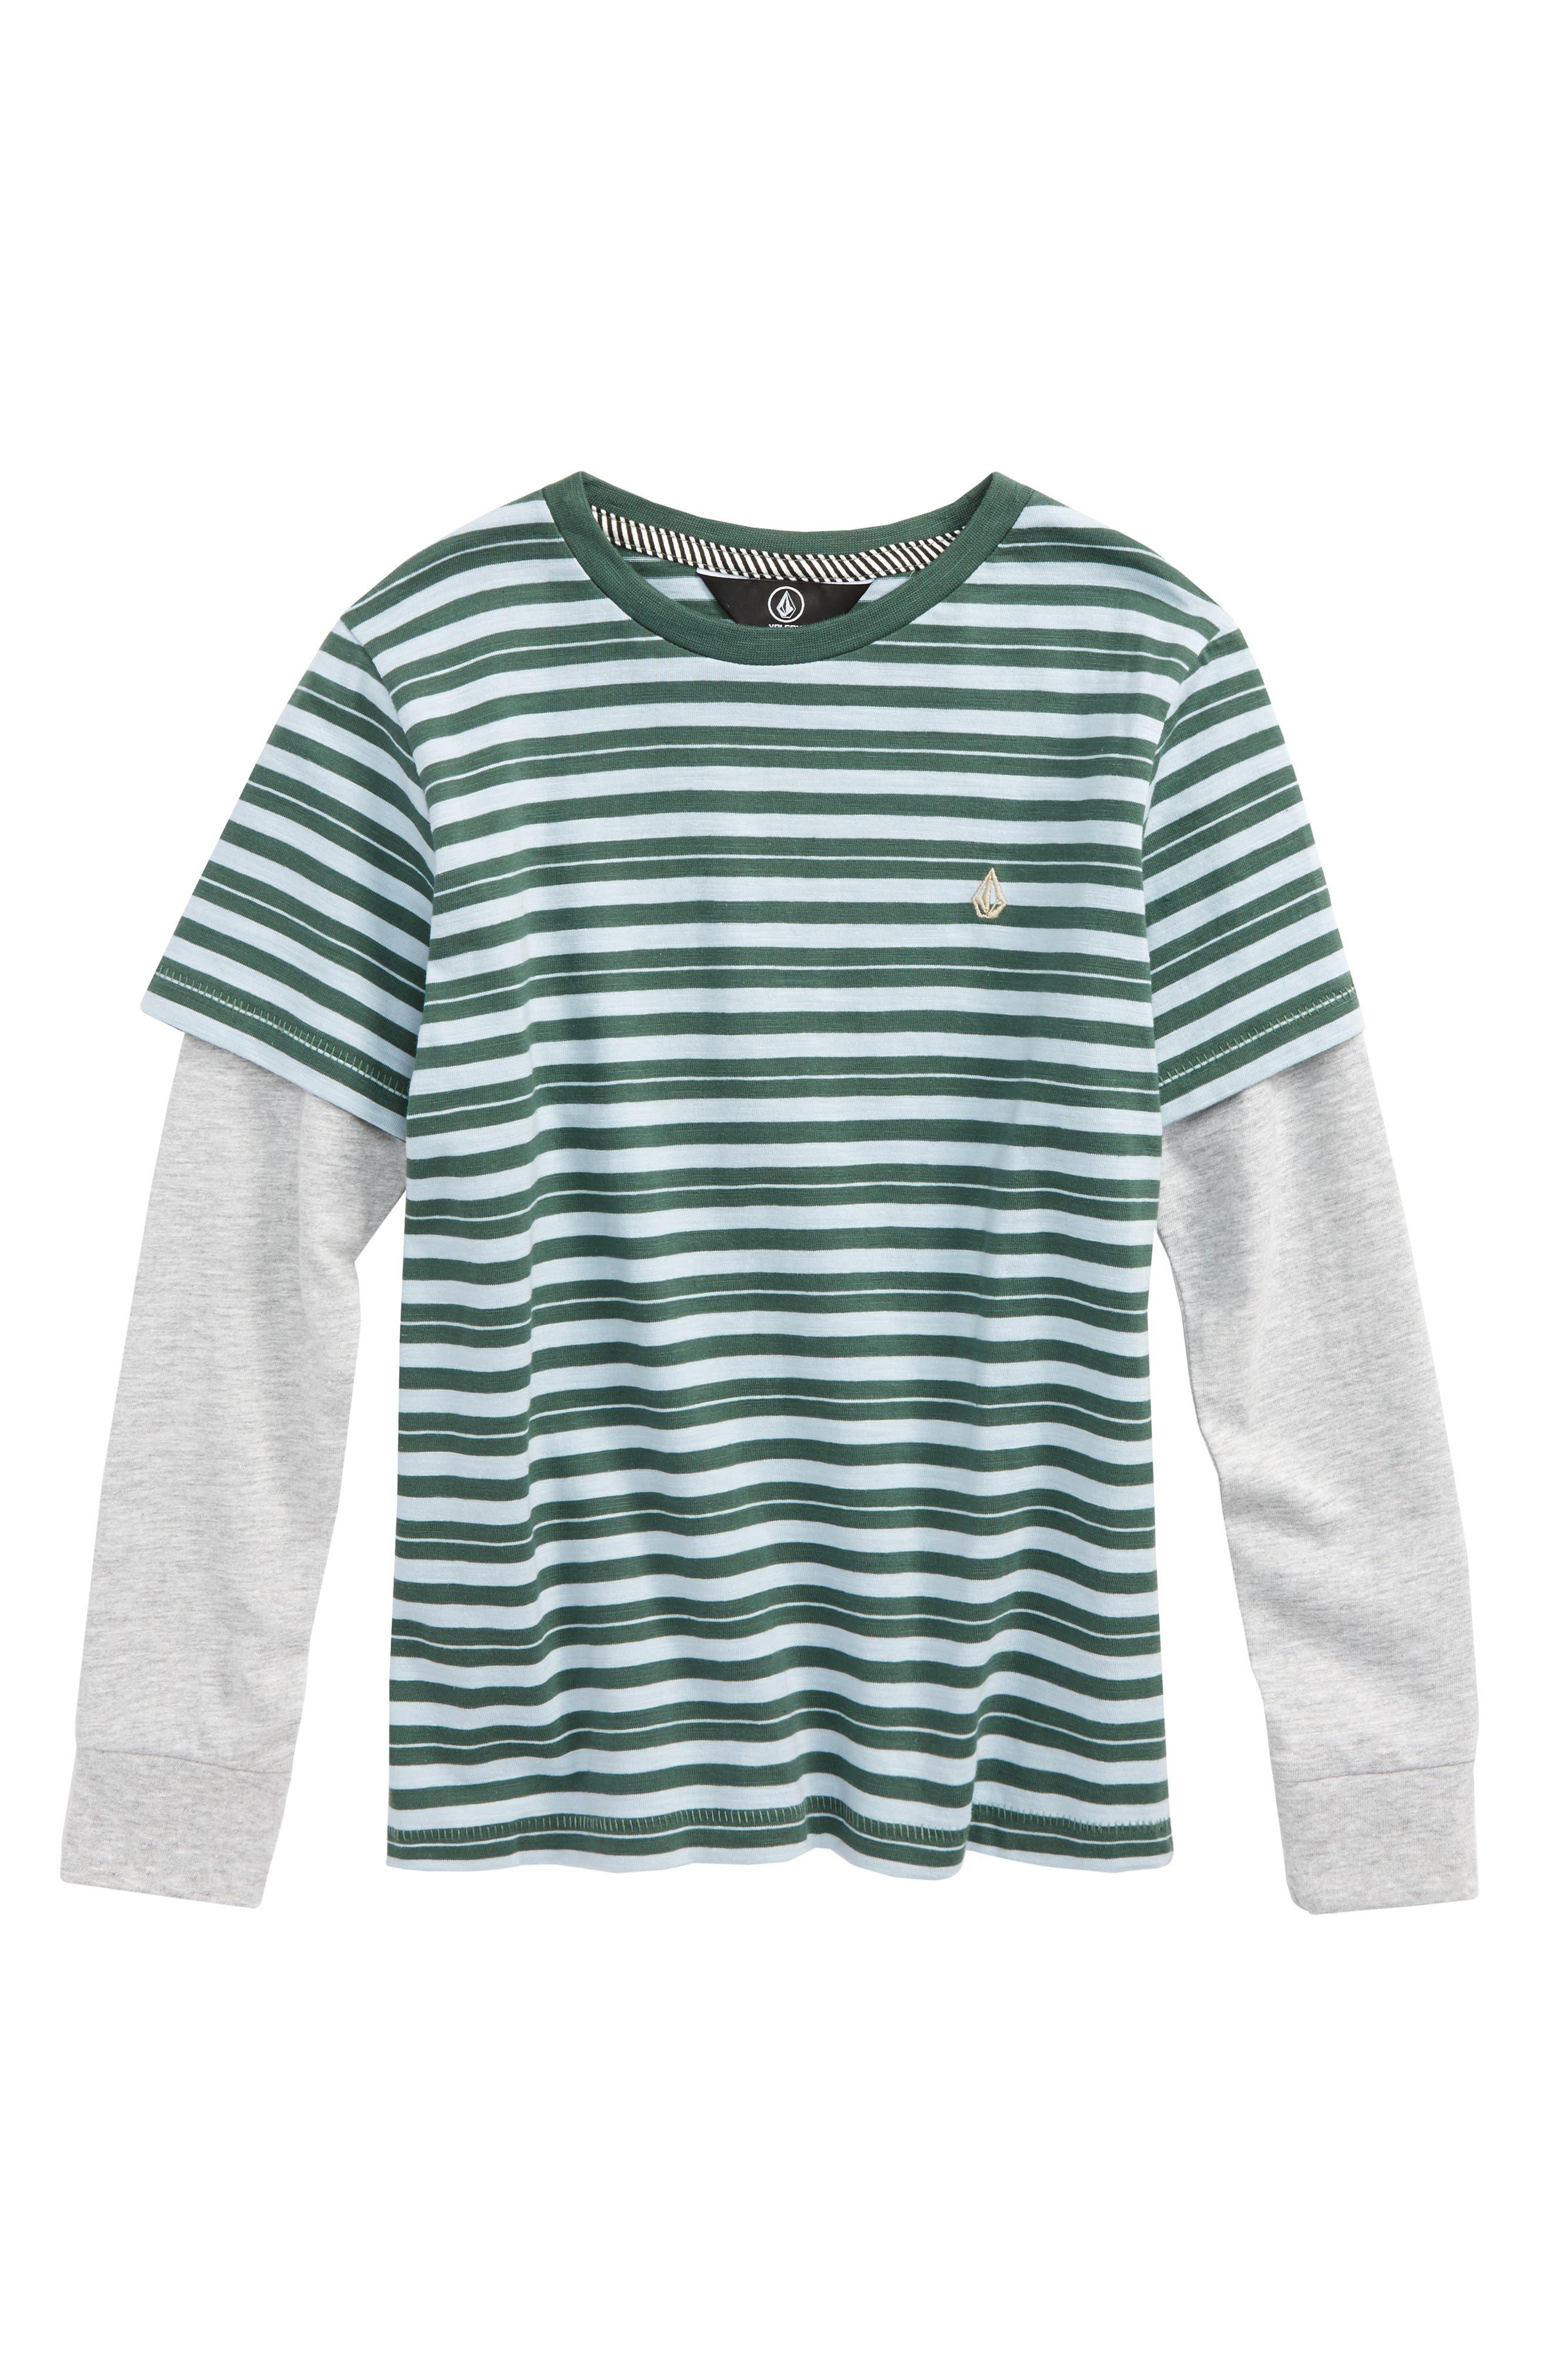 Alternate Image 1 Selected - Volcom Impact Twofer Layered T-Shirt (Toddler Boys & Little Boys)